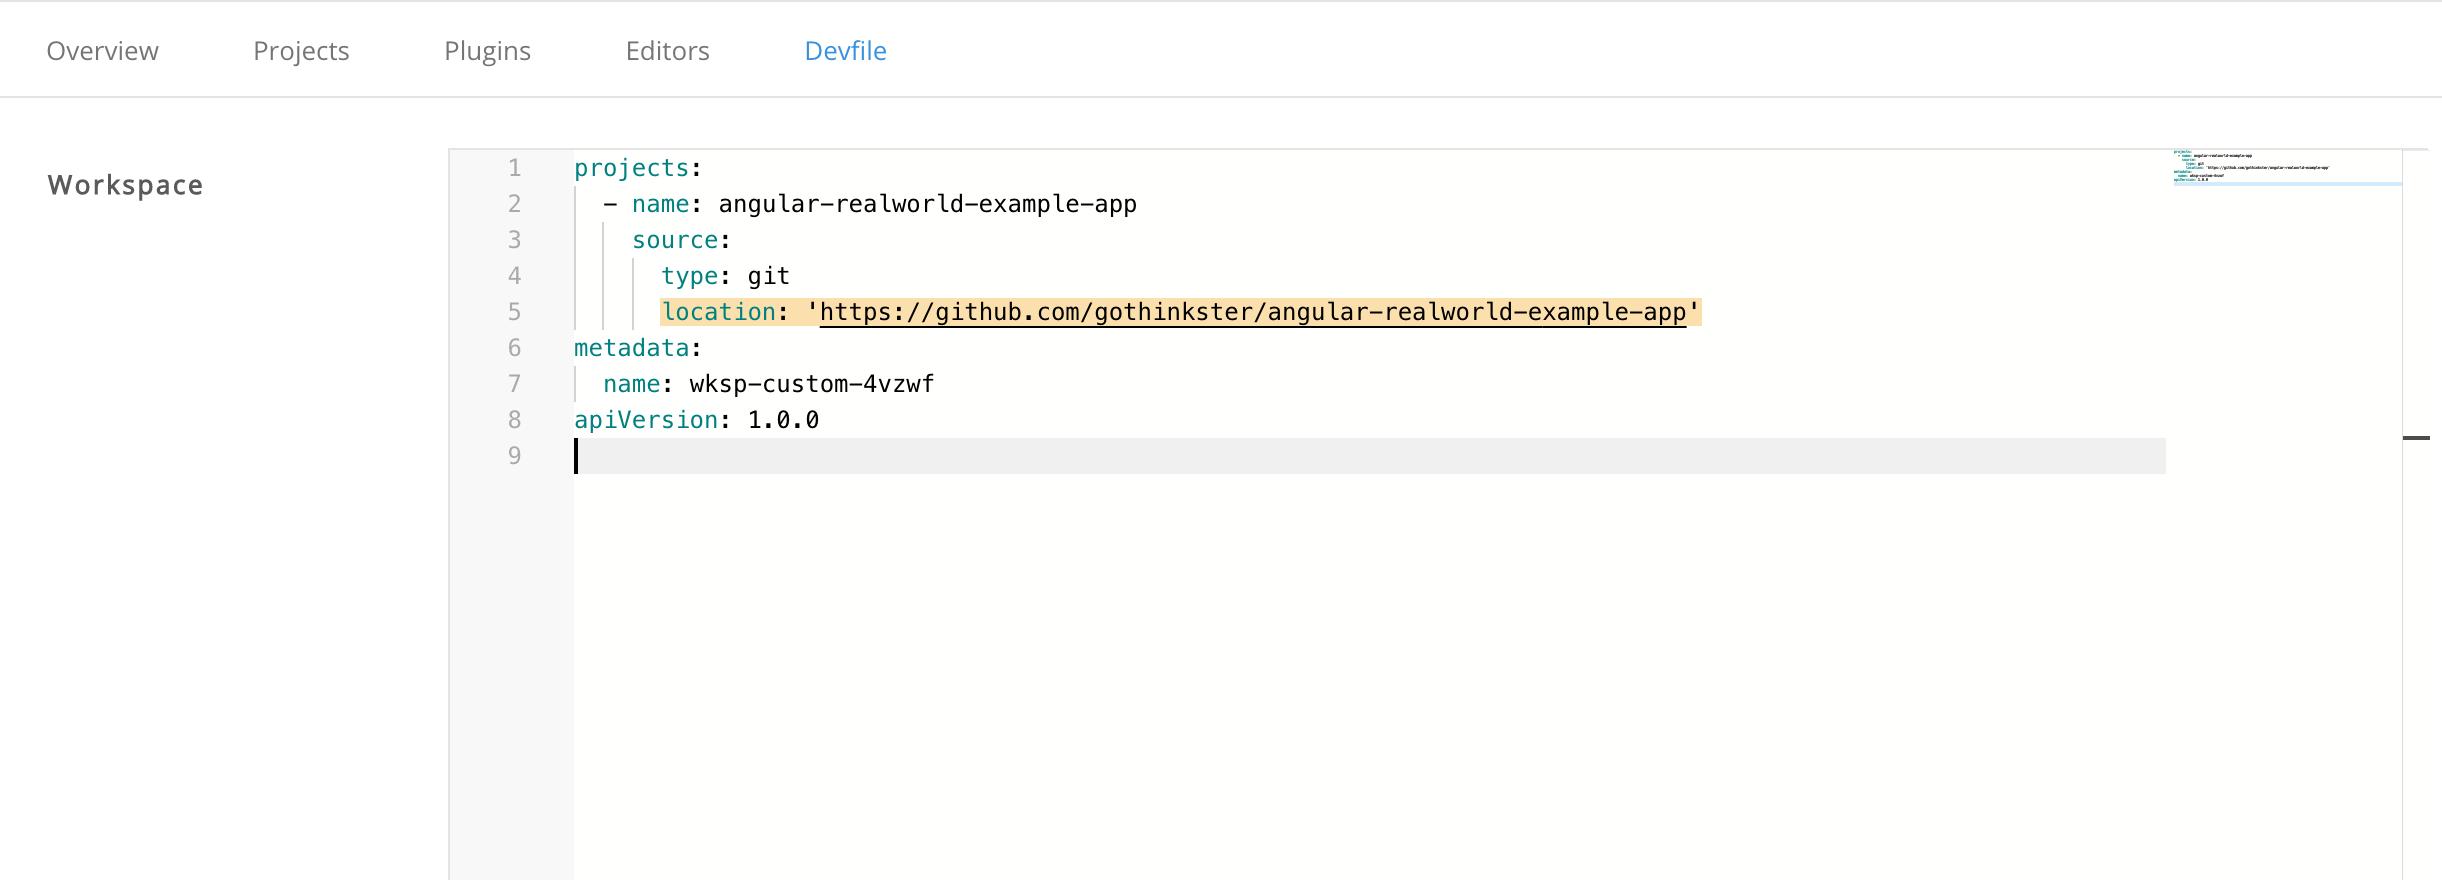 Edit Devfile Content